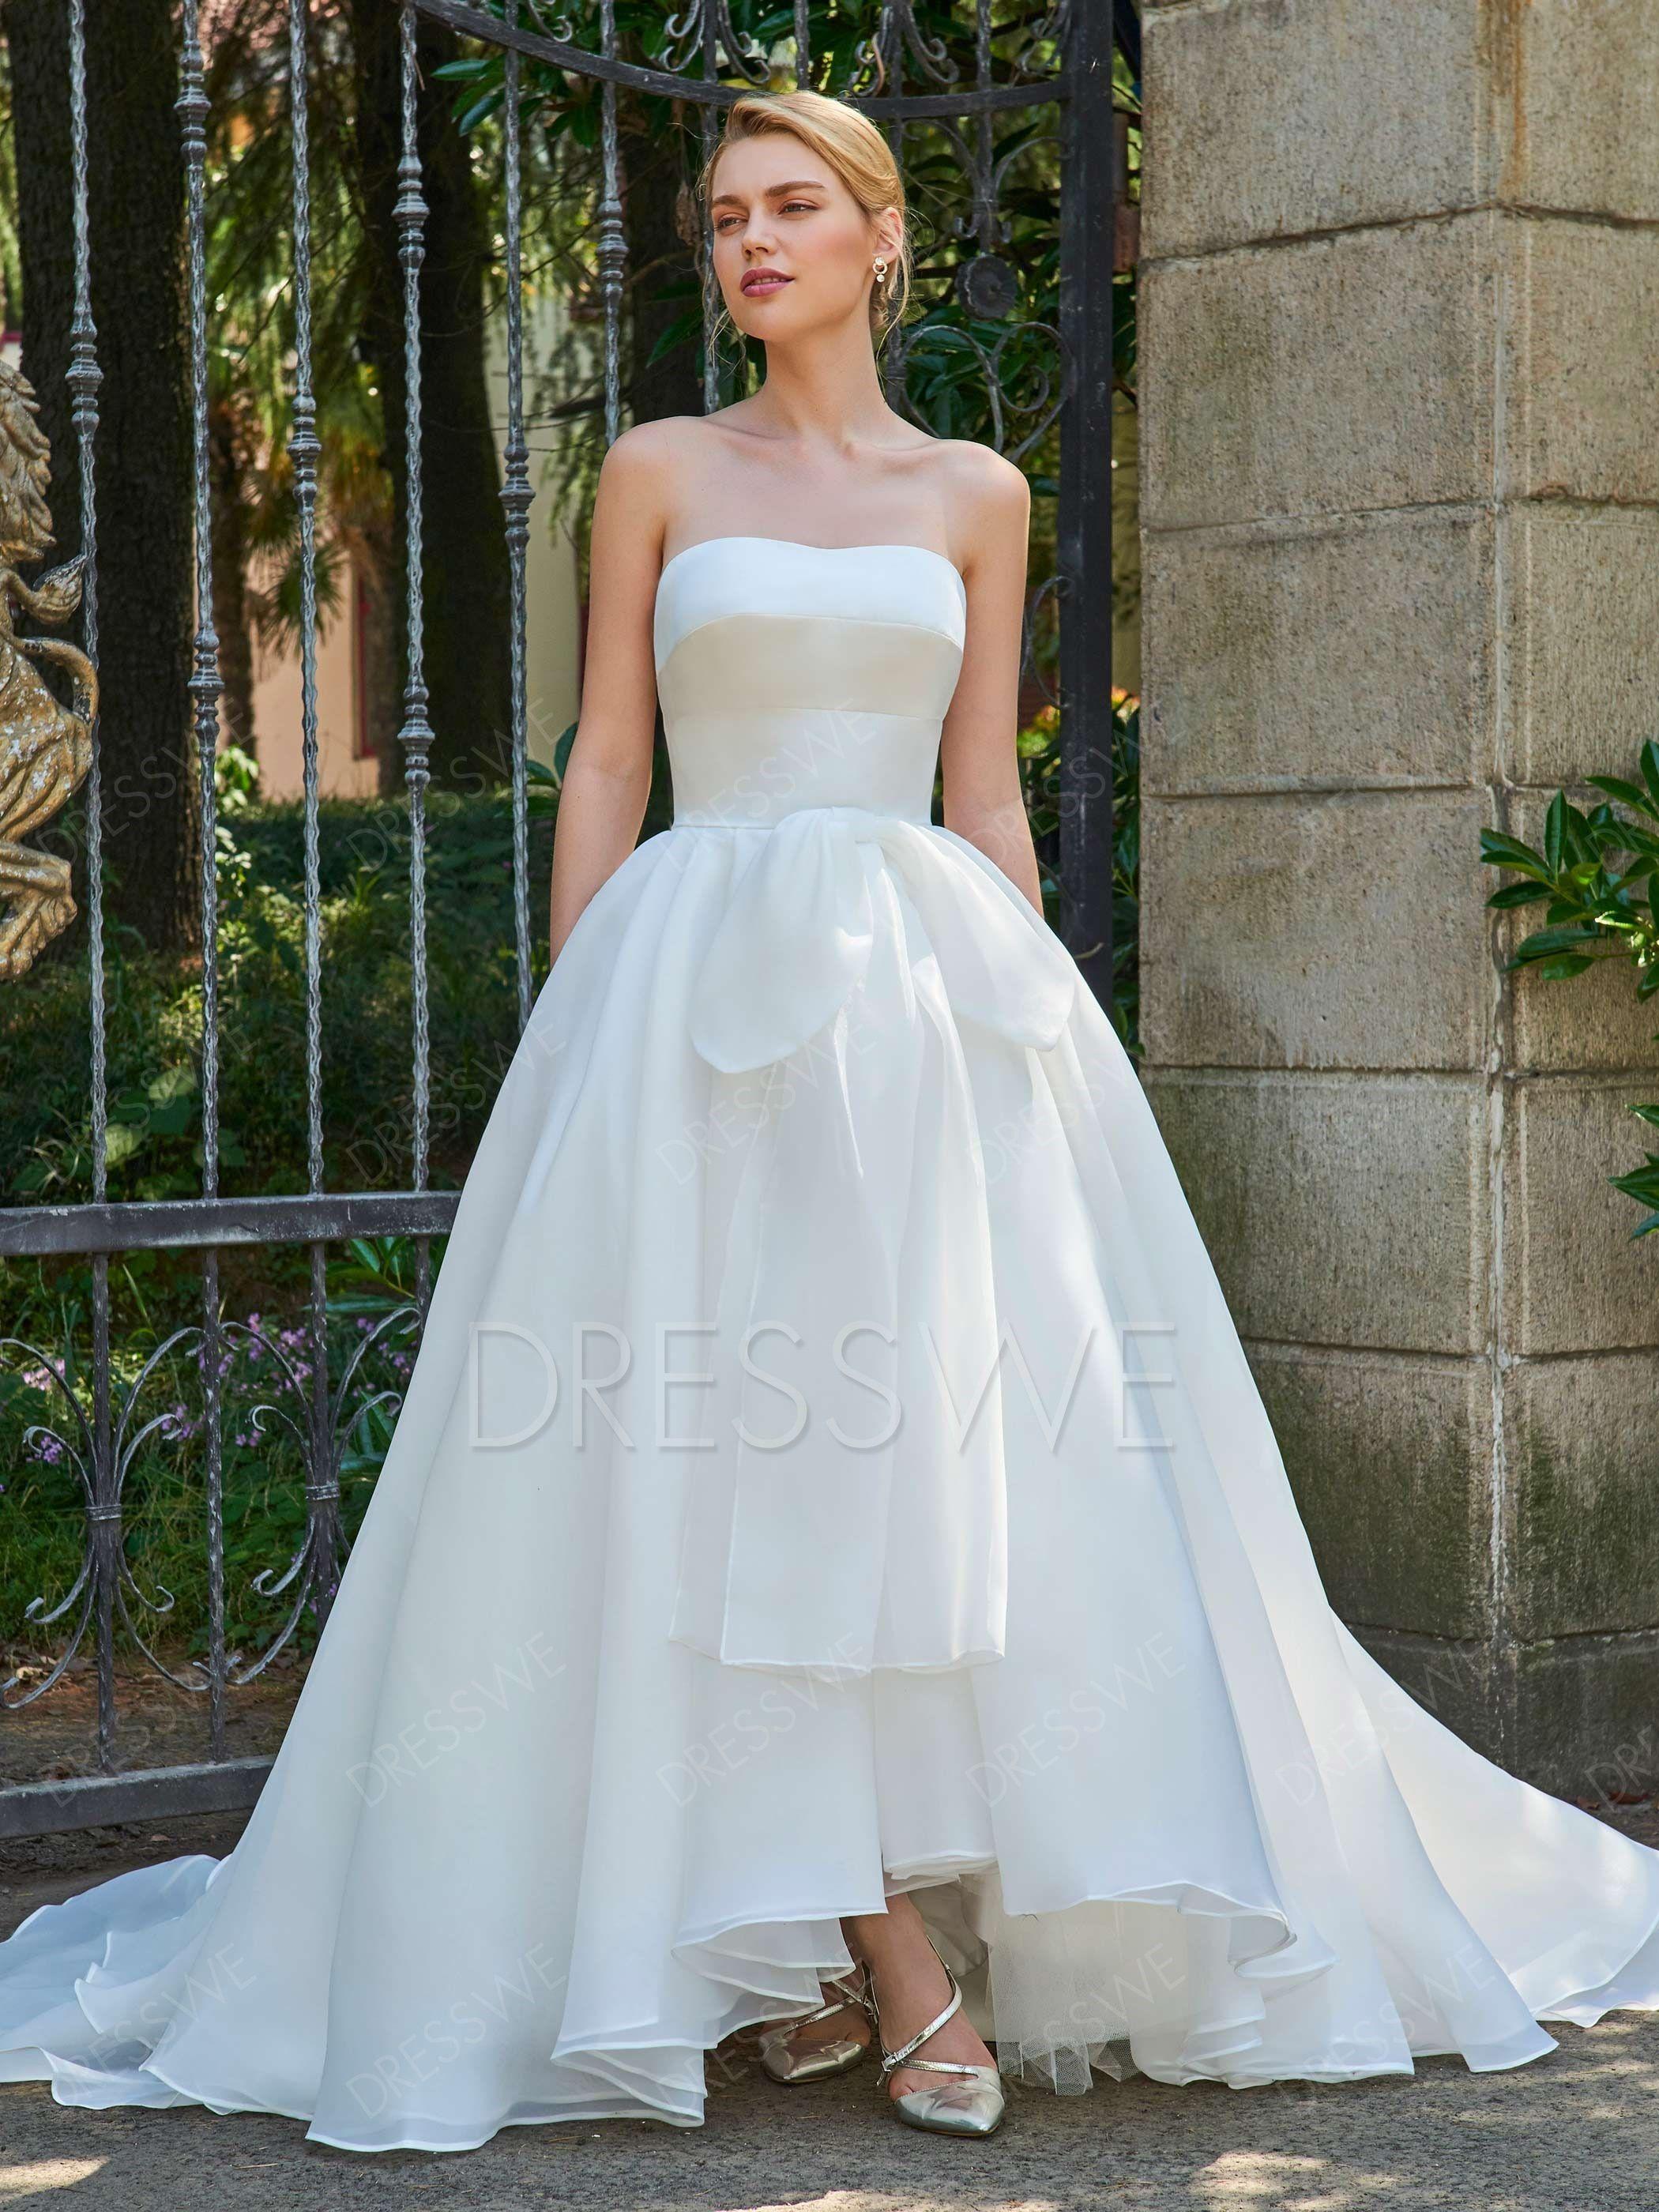 Attractive Wedding Dress Supplies Image - All Wedding Dresses ...